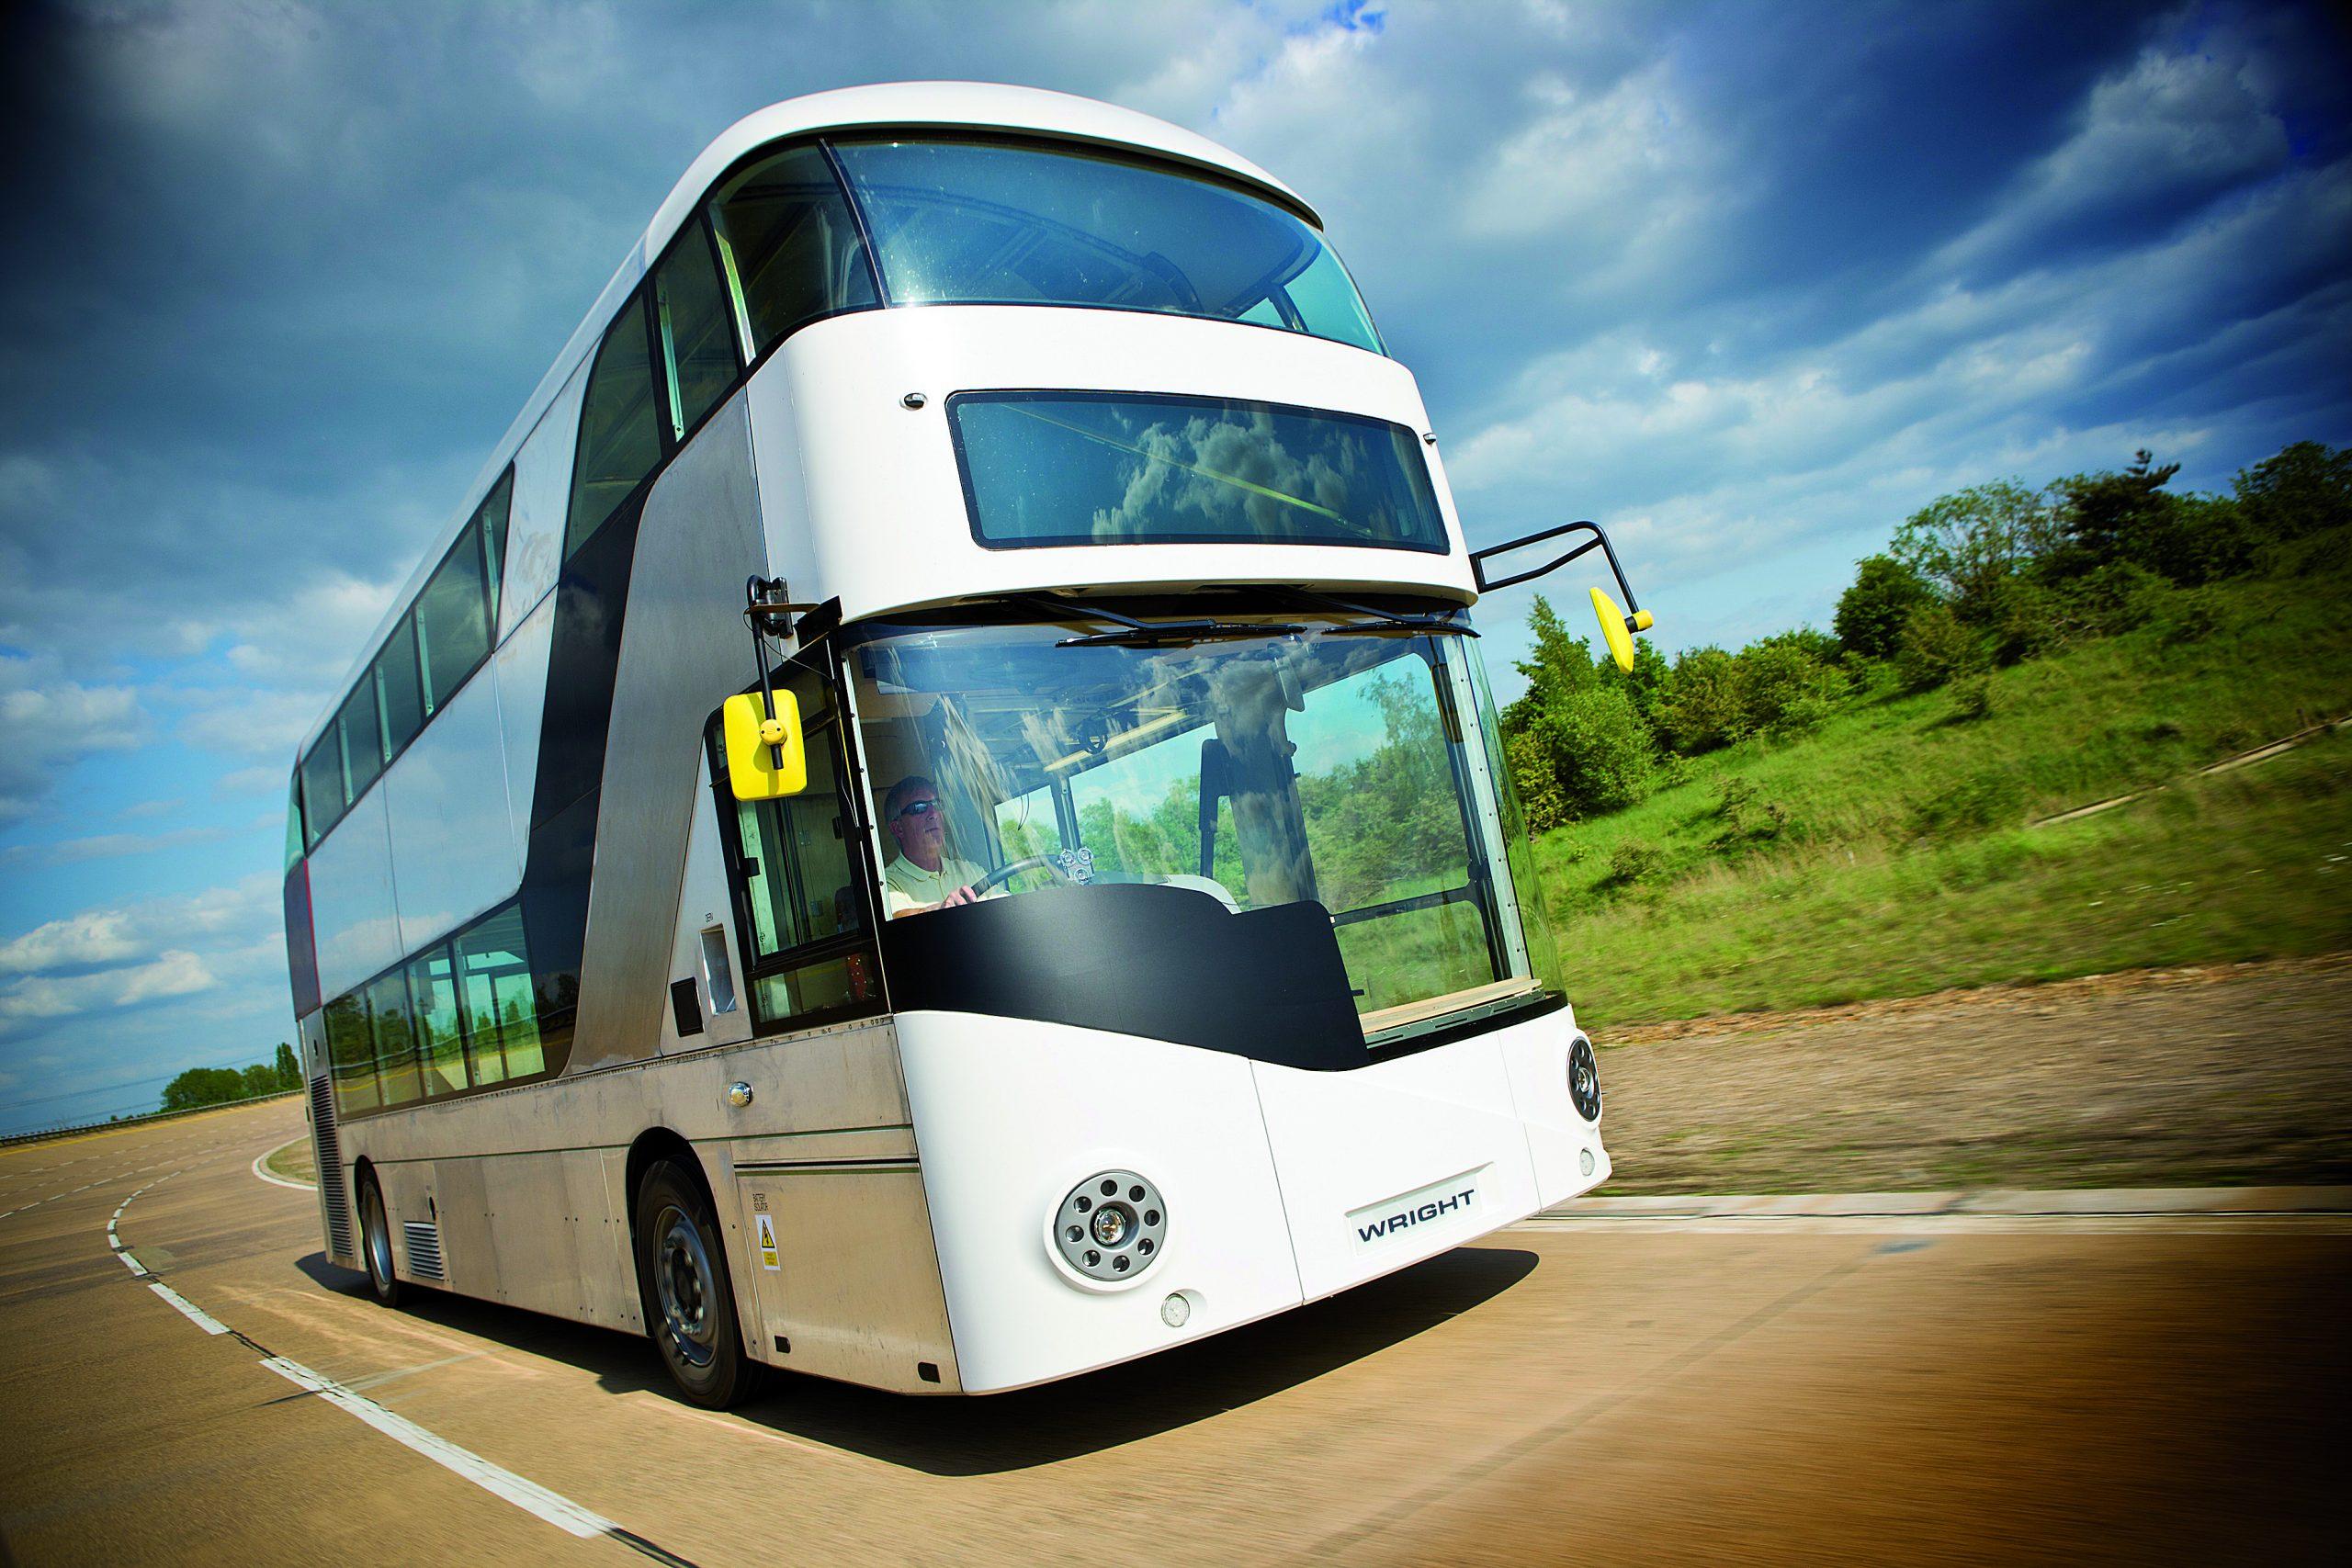 White double decker bus